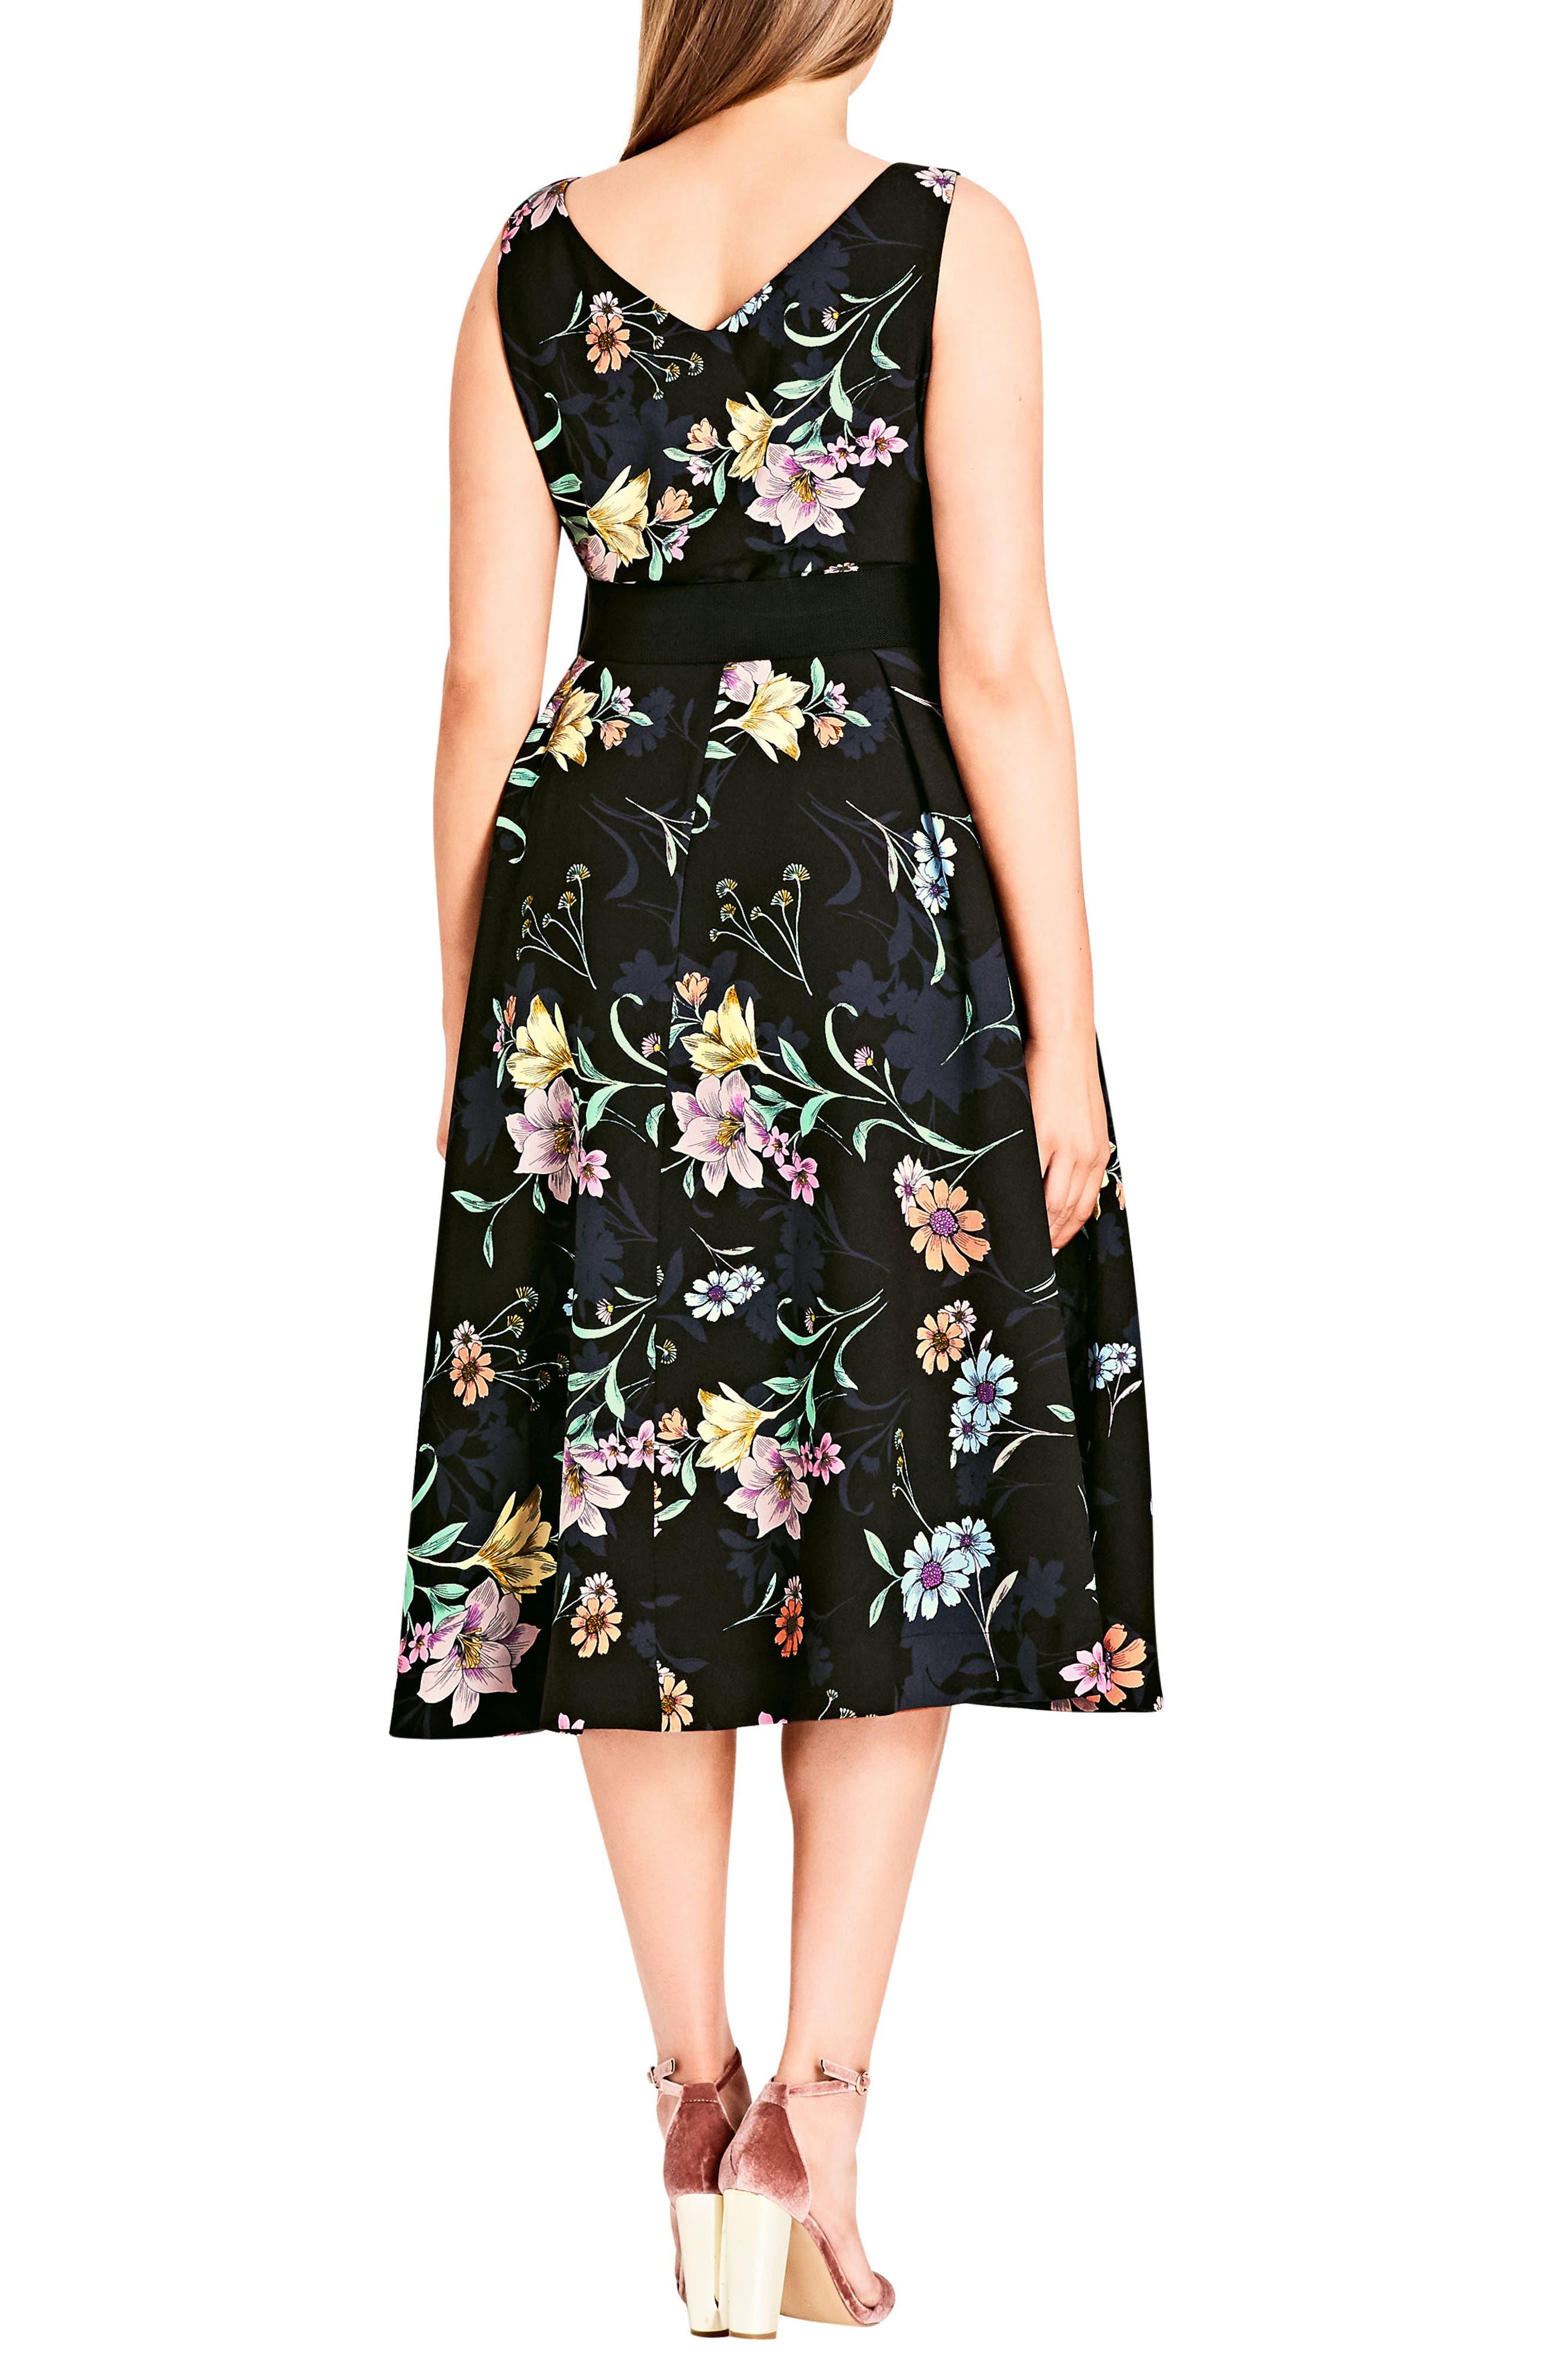 Sketch Love Floral A-Line Midi Dress,                             Alternate thumbnail 2, color,                             Black